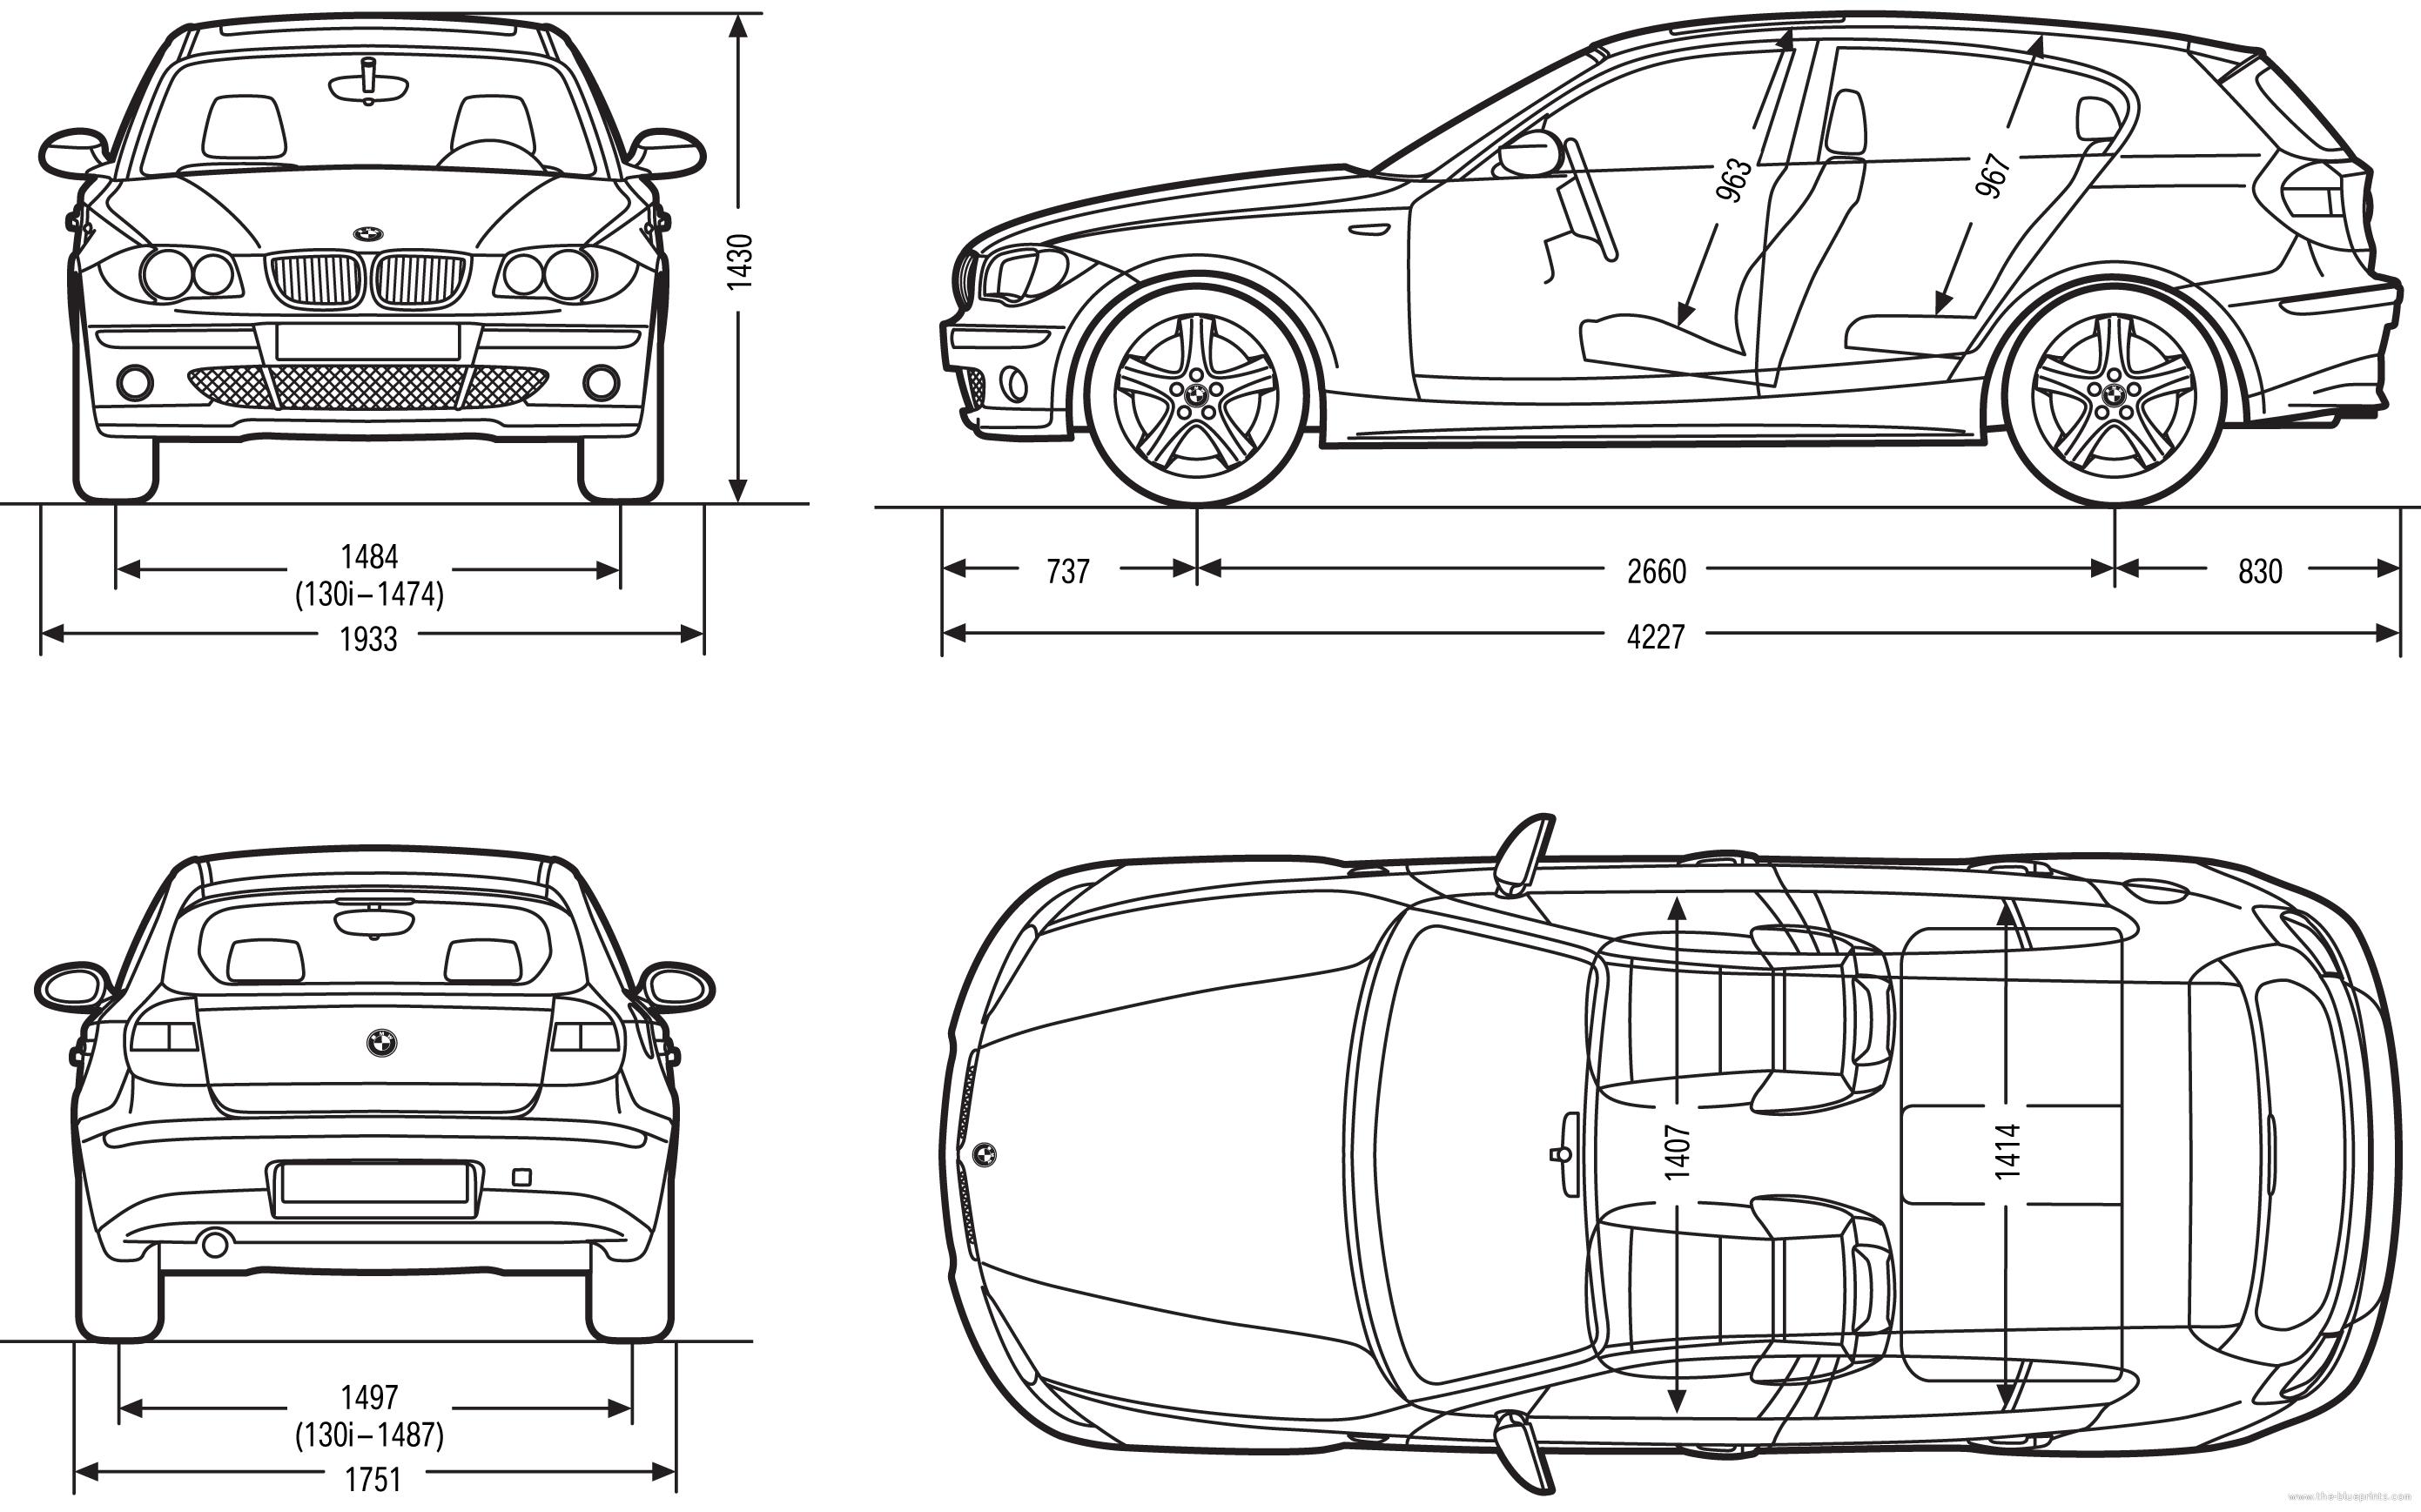 The blueprints com vector drawing opel astra k 5 door - Bmw 1 Series 5 Door E87 2007 Sc 1 St The Blueprints Com